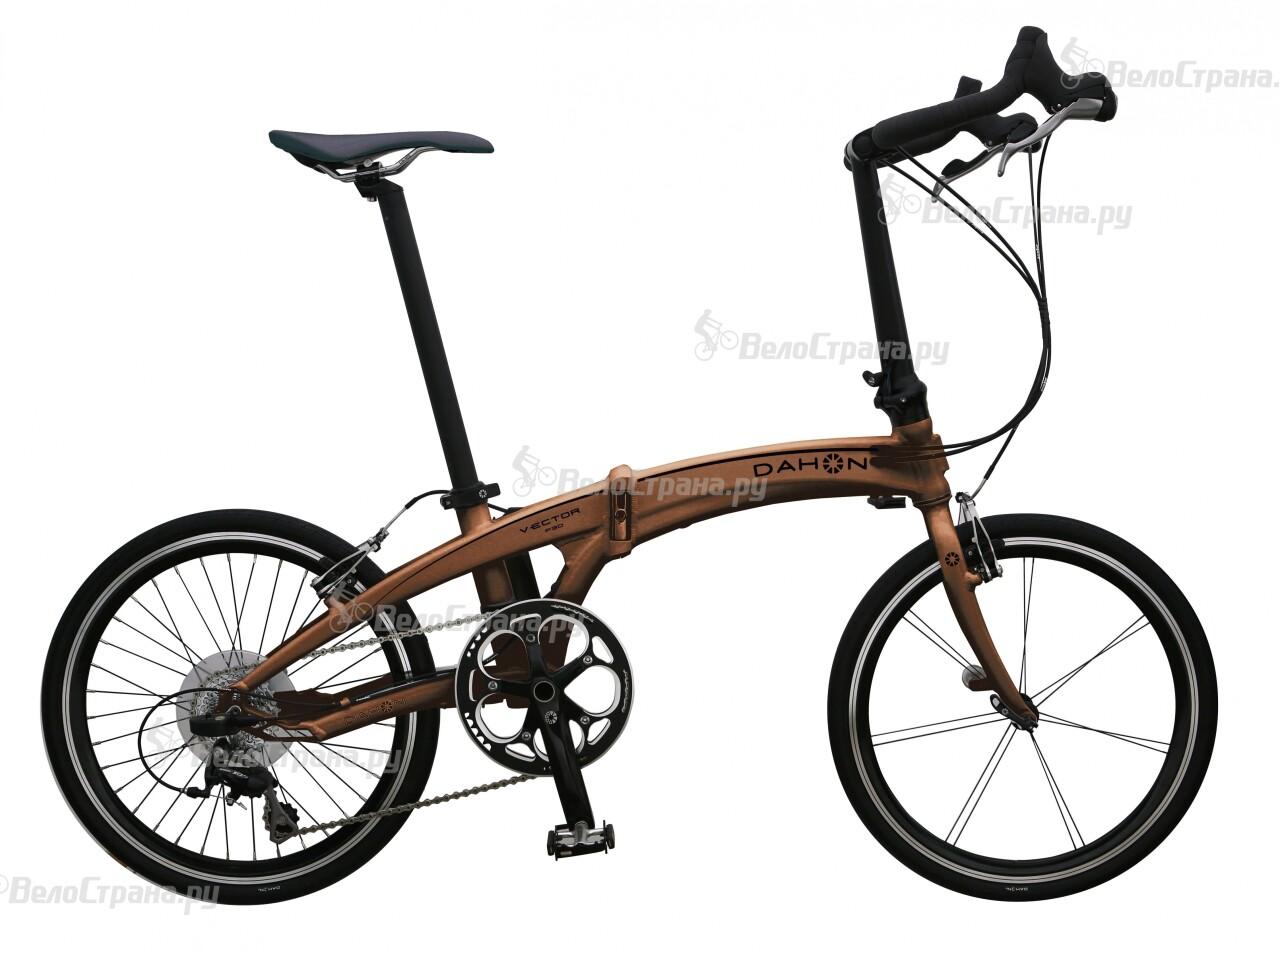 Велосипед Dahon Vector DD30 (2015) vector hx300